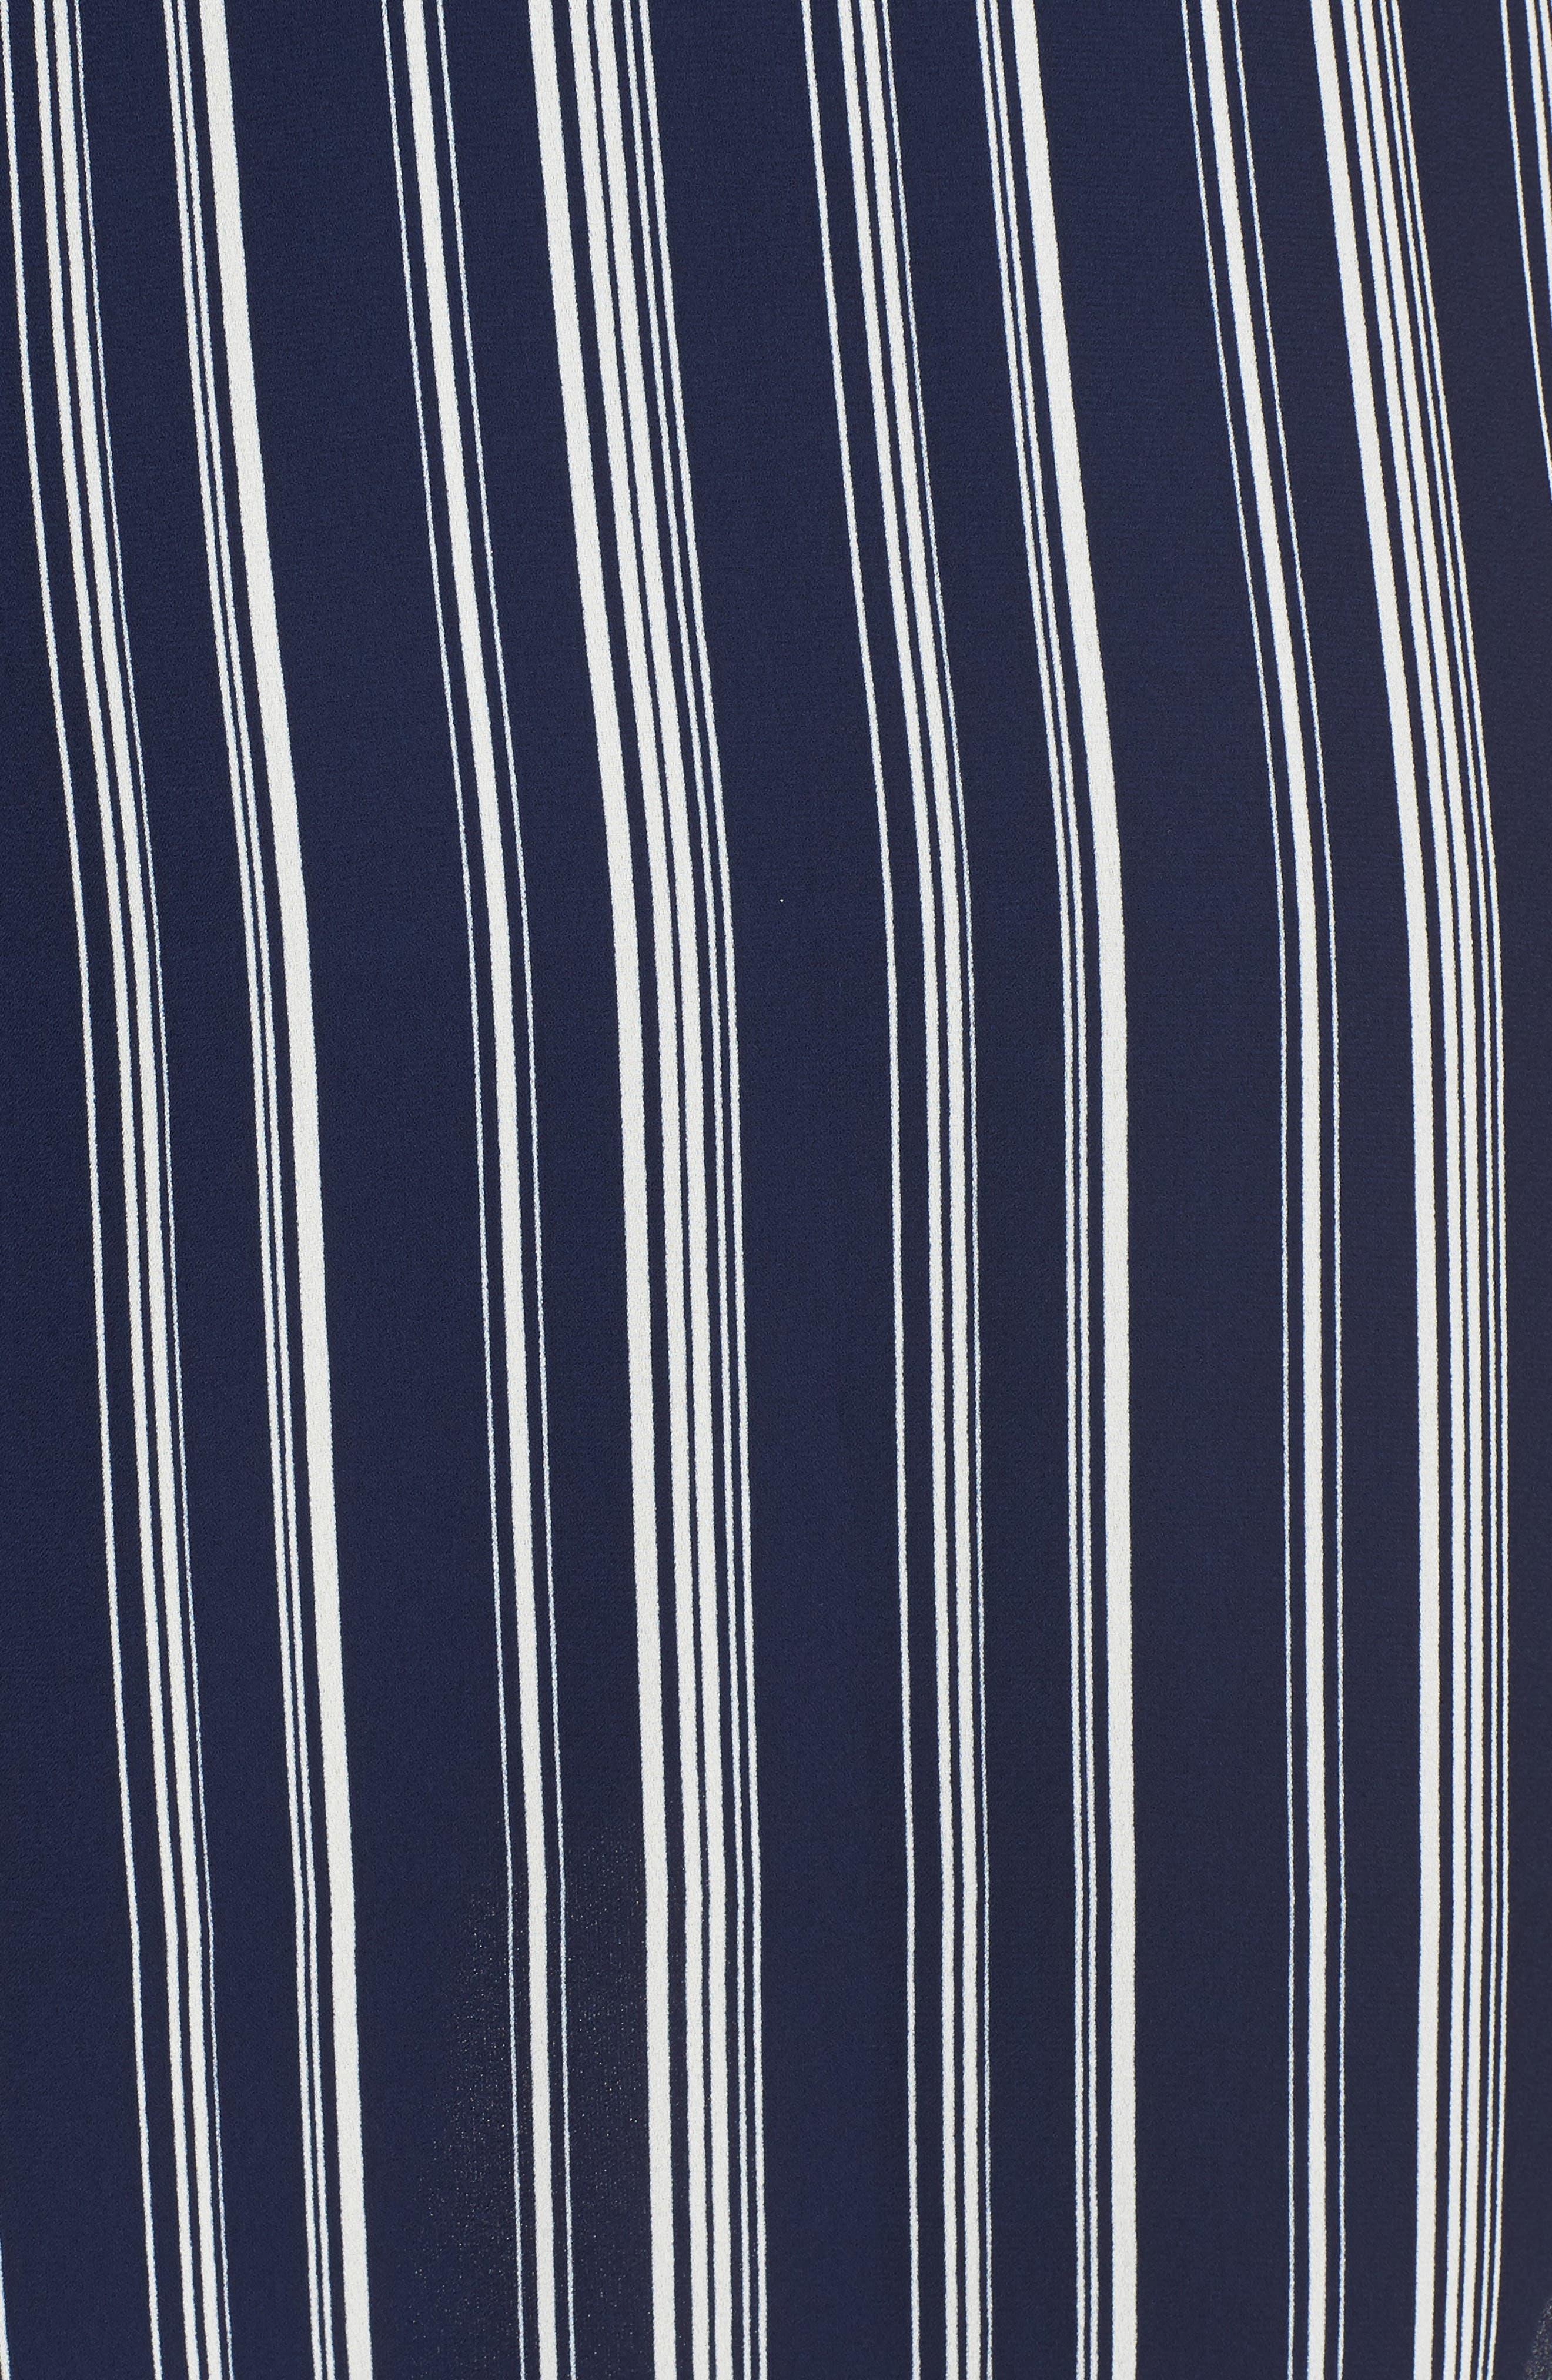 Elly Wrap Dress,                             Alternate thumbnail 53, color,